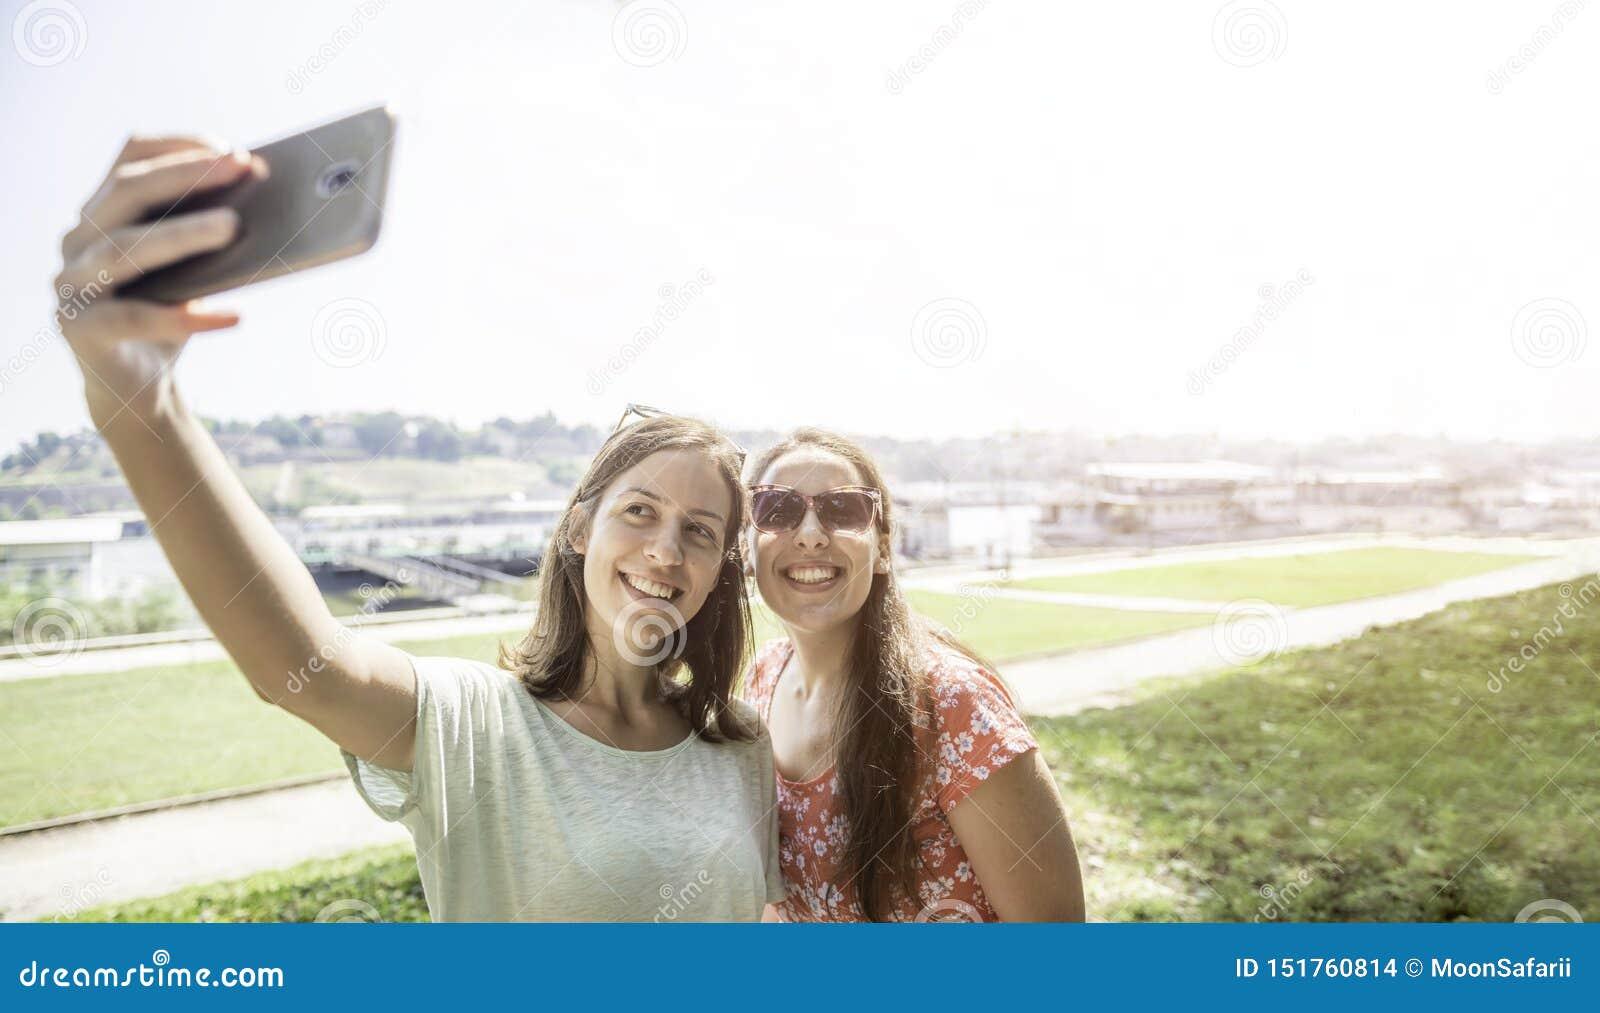 Girlfriends taking selfie together having fun outdoors concept of modern women friendship lifestyle female best friends happy